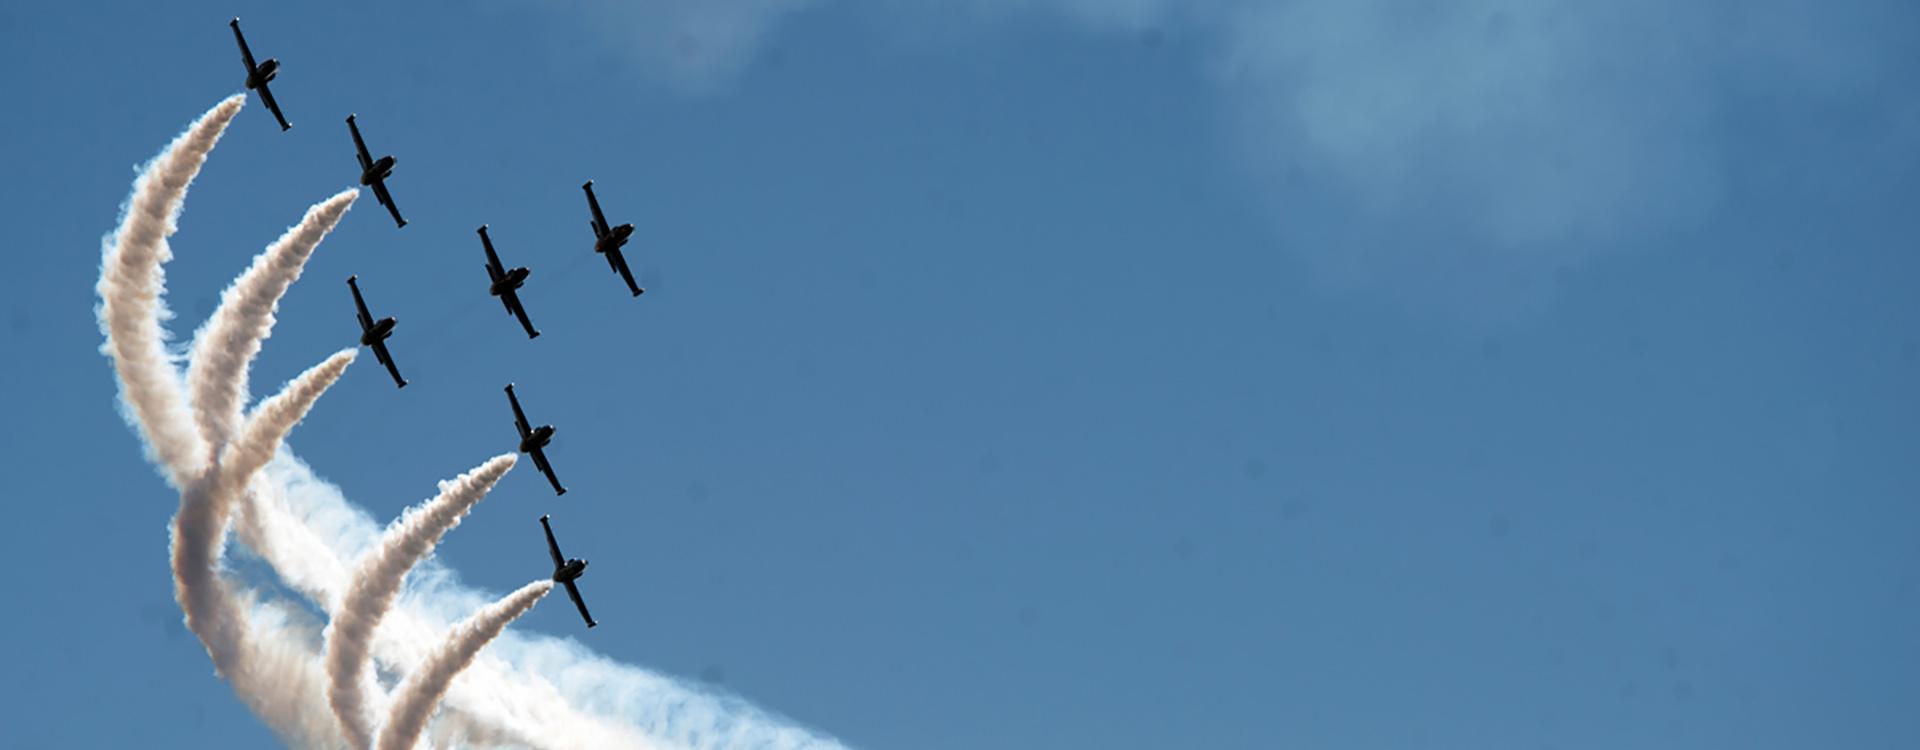 Incentive Jet Flight Formation